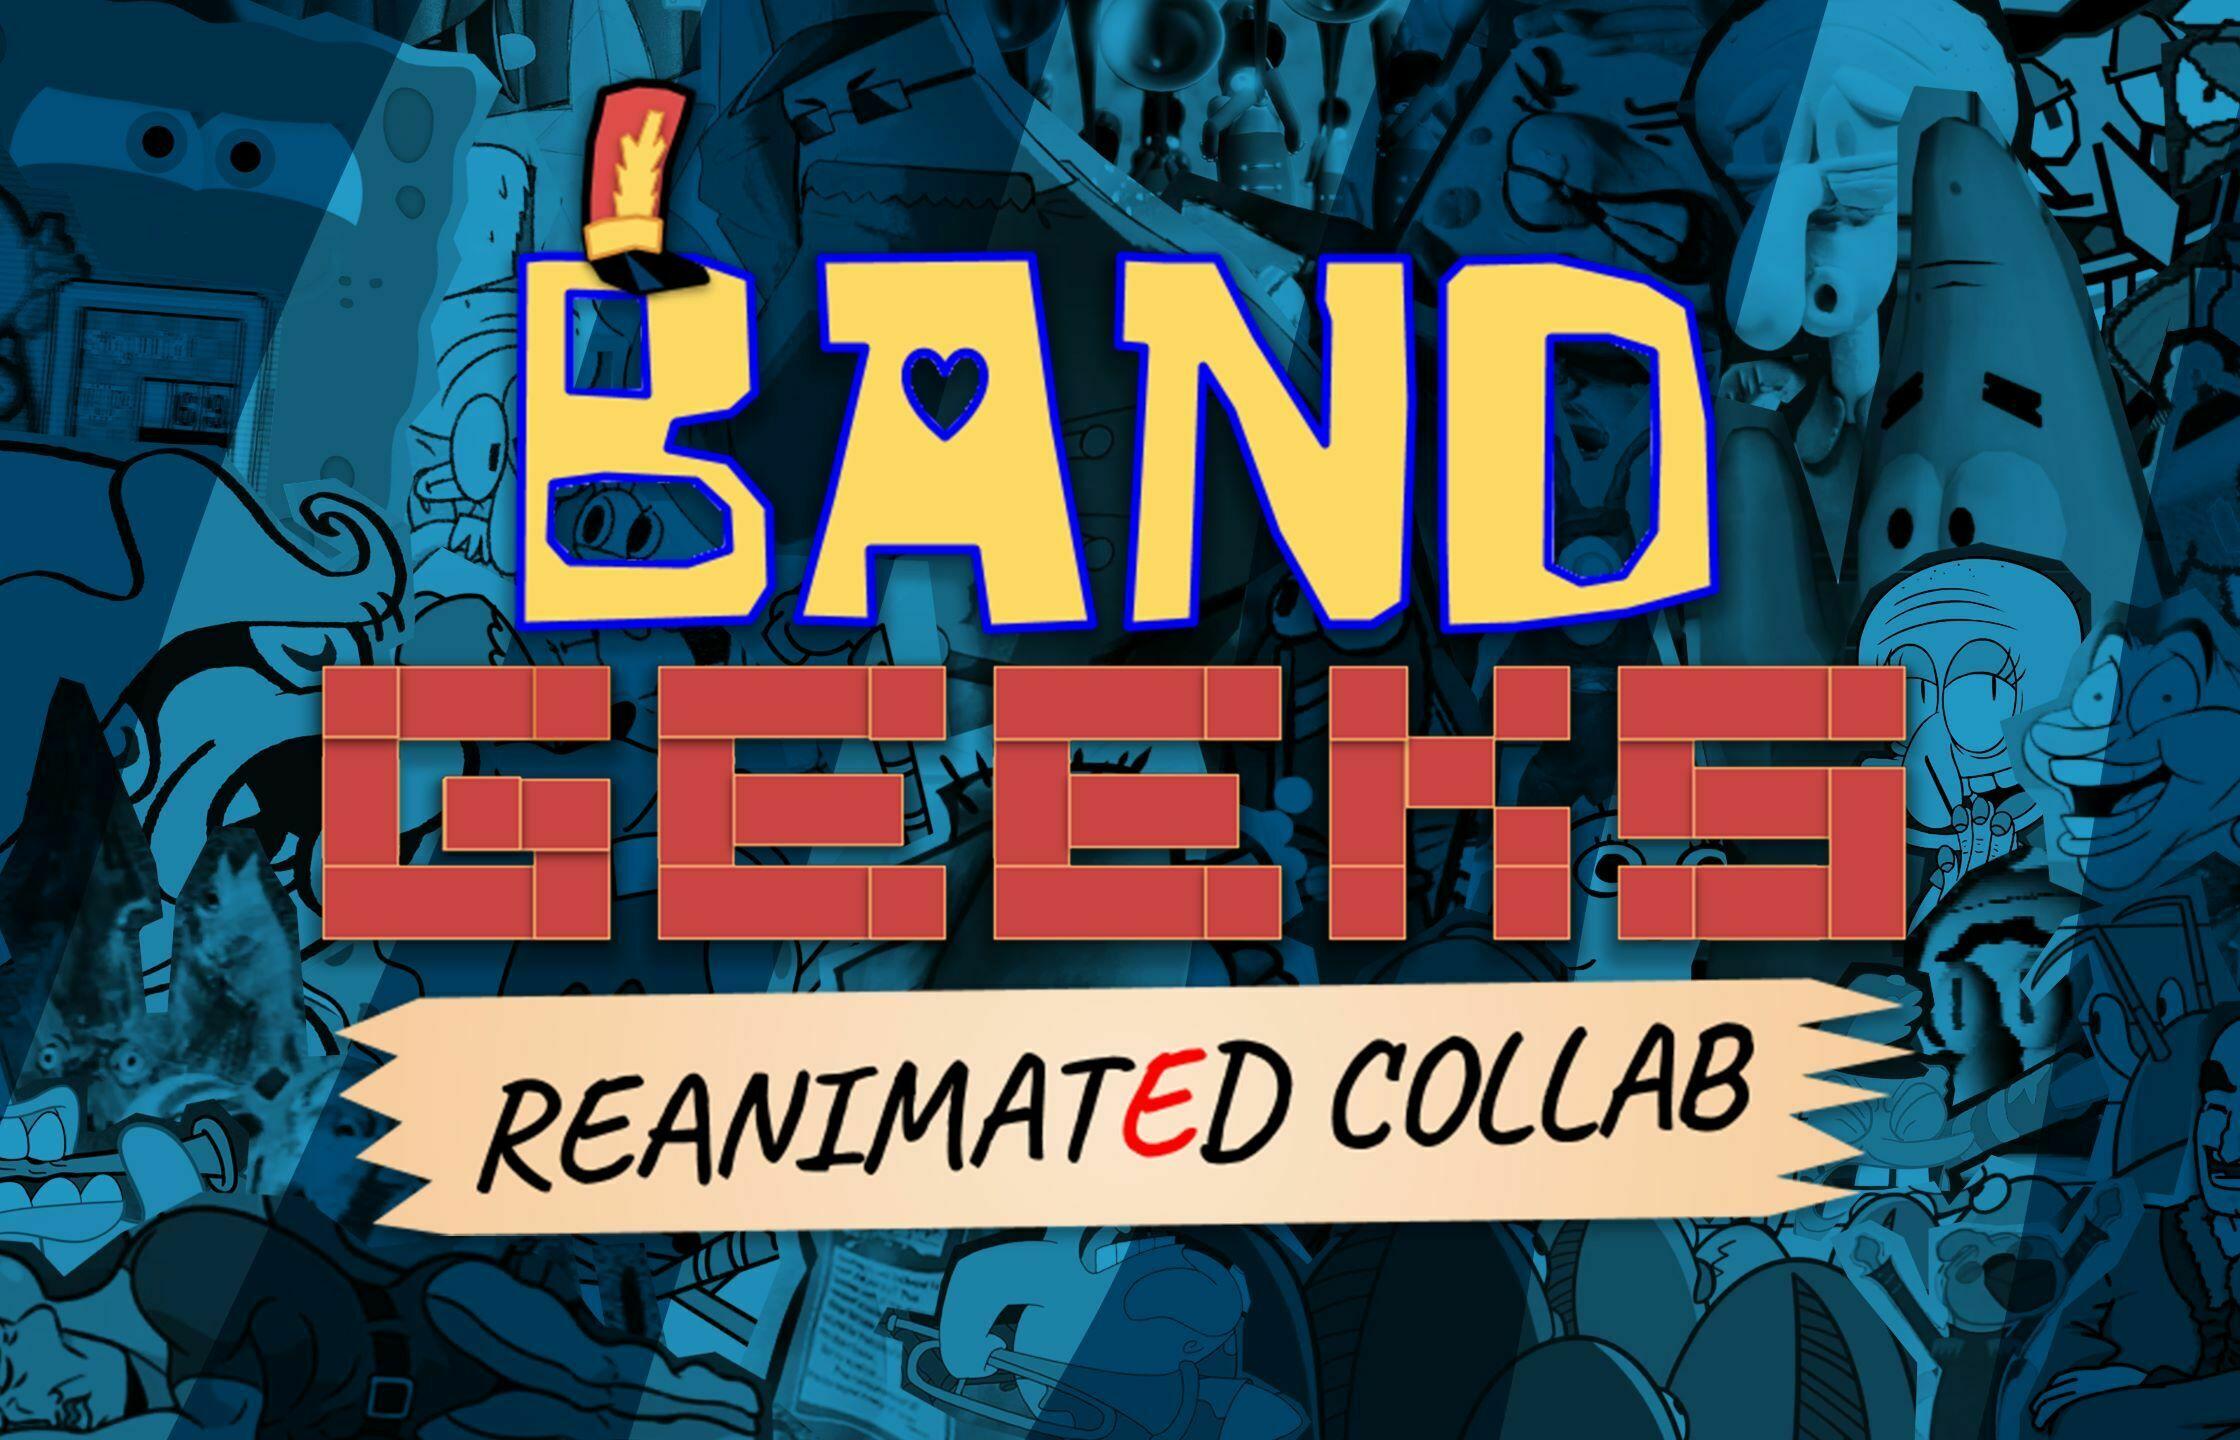 Spongebob Band Geeks Reanimated Collab